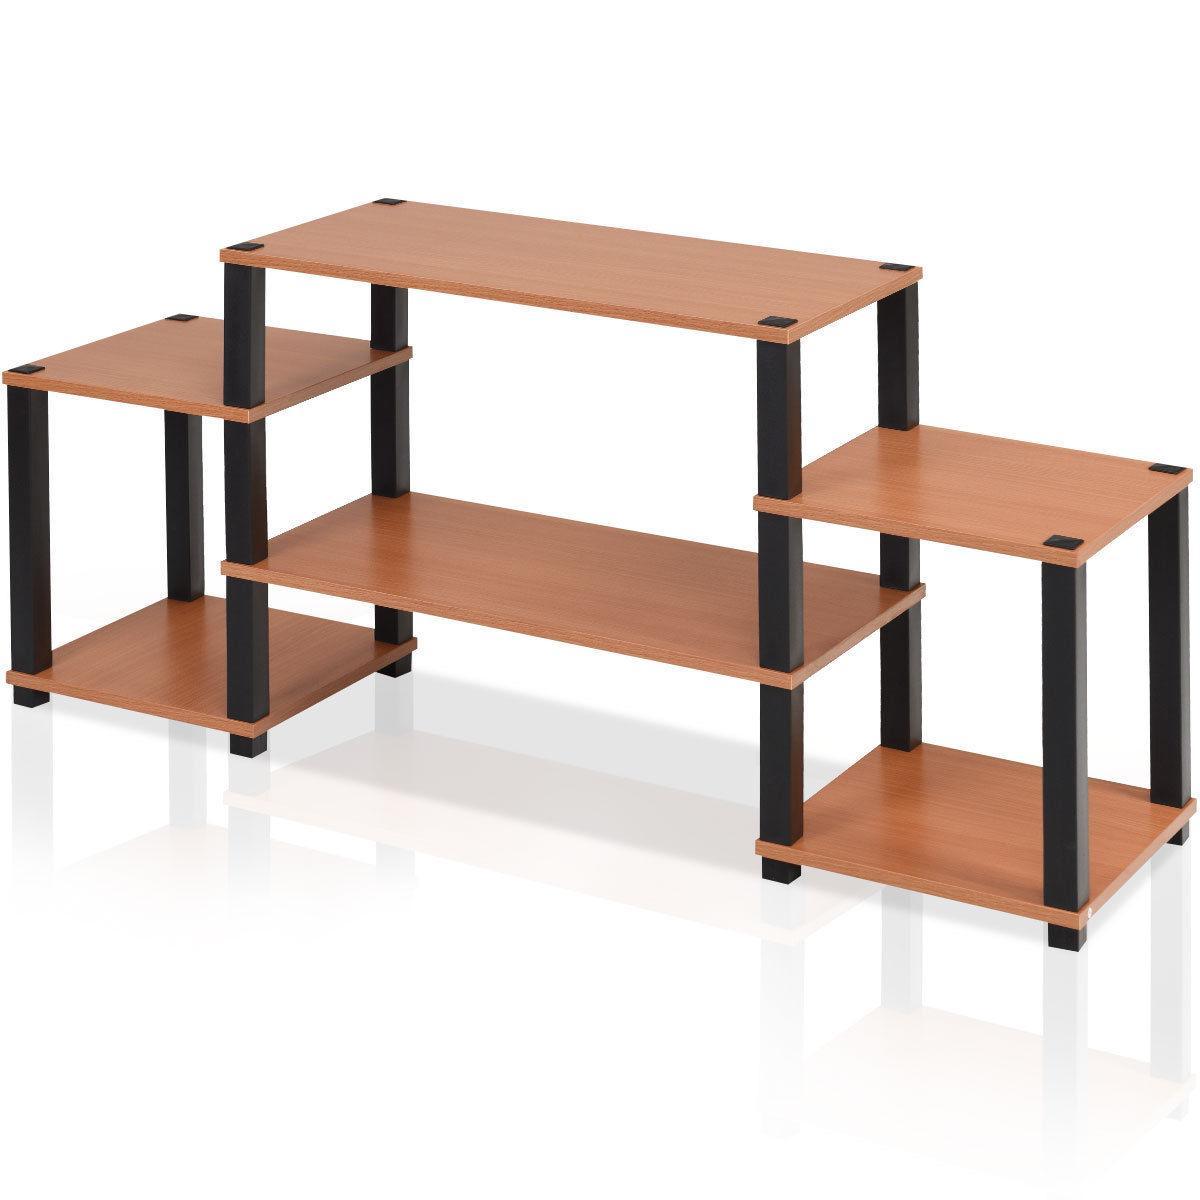 "57"" L TV Stand Entertainment Media Console Furniture Cabinet"